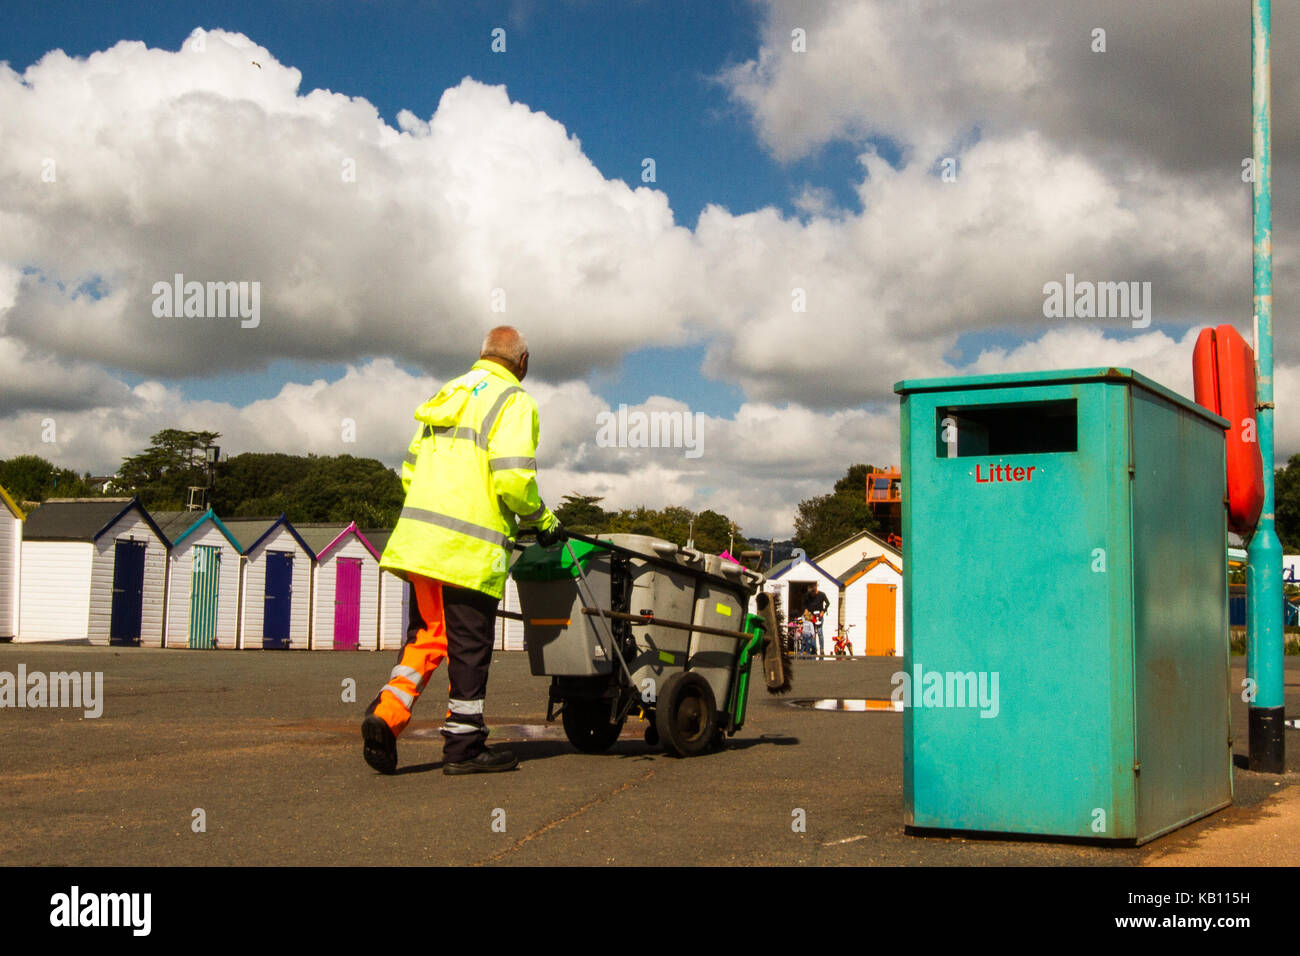 seaside beach rubbish bin litter collection, waste management - Stock Image